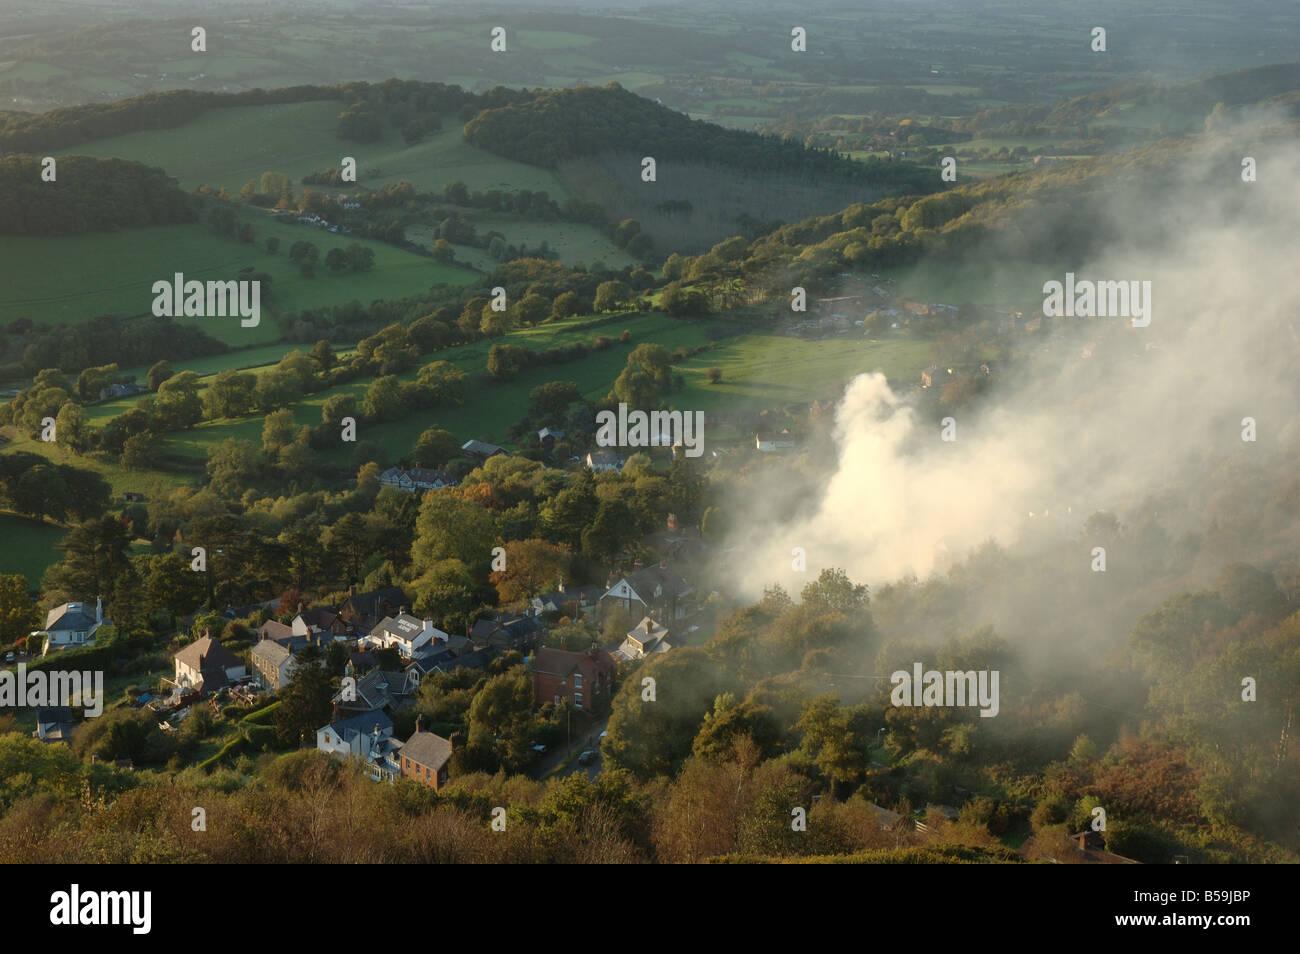 plume of smoke drifting across the Malvern Hills, Worcestershire, England, UK - Stock Image